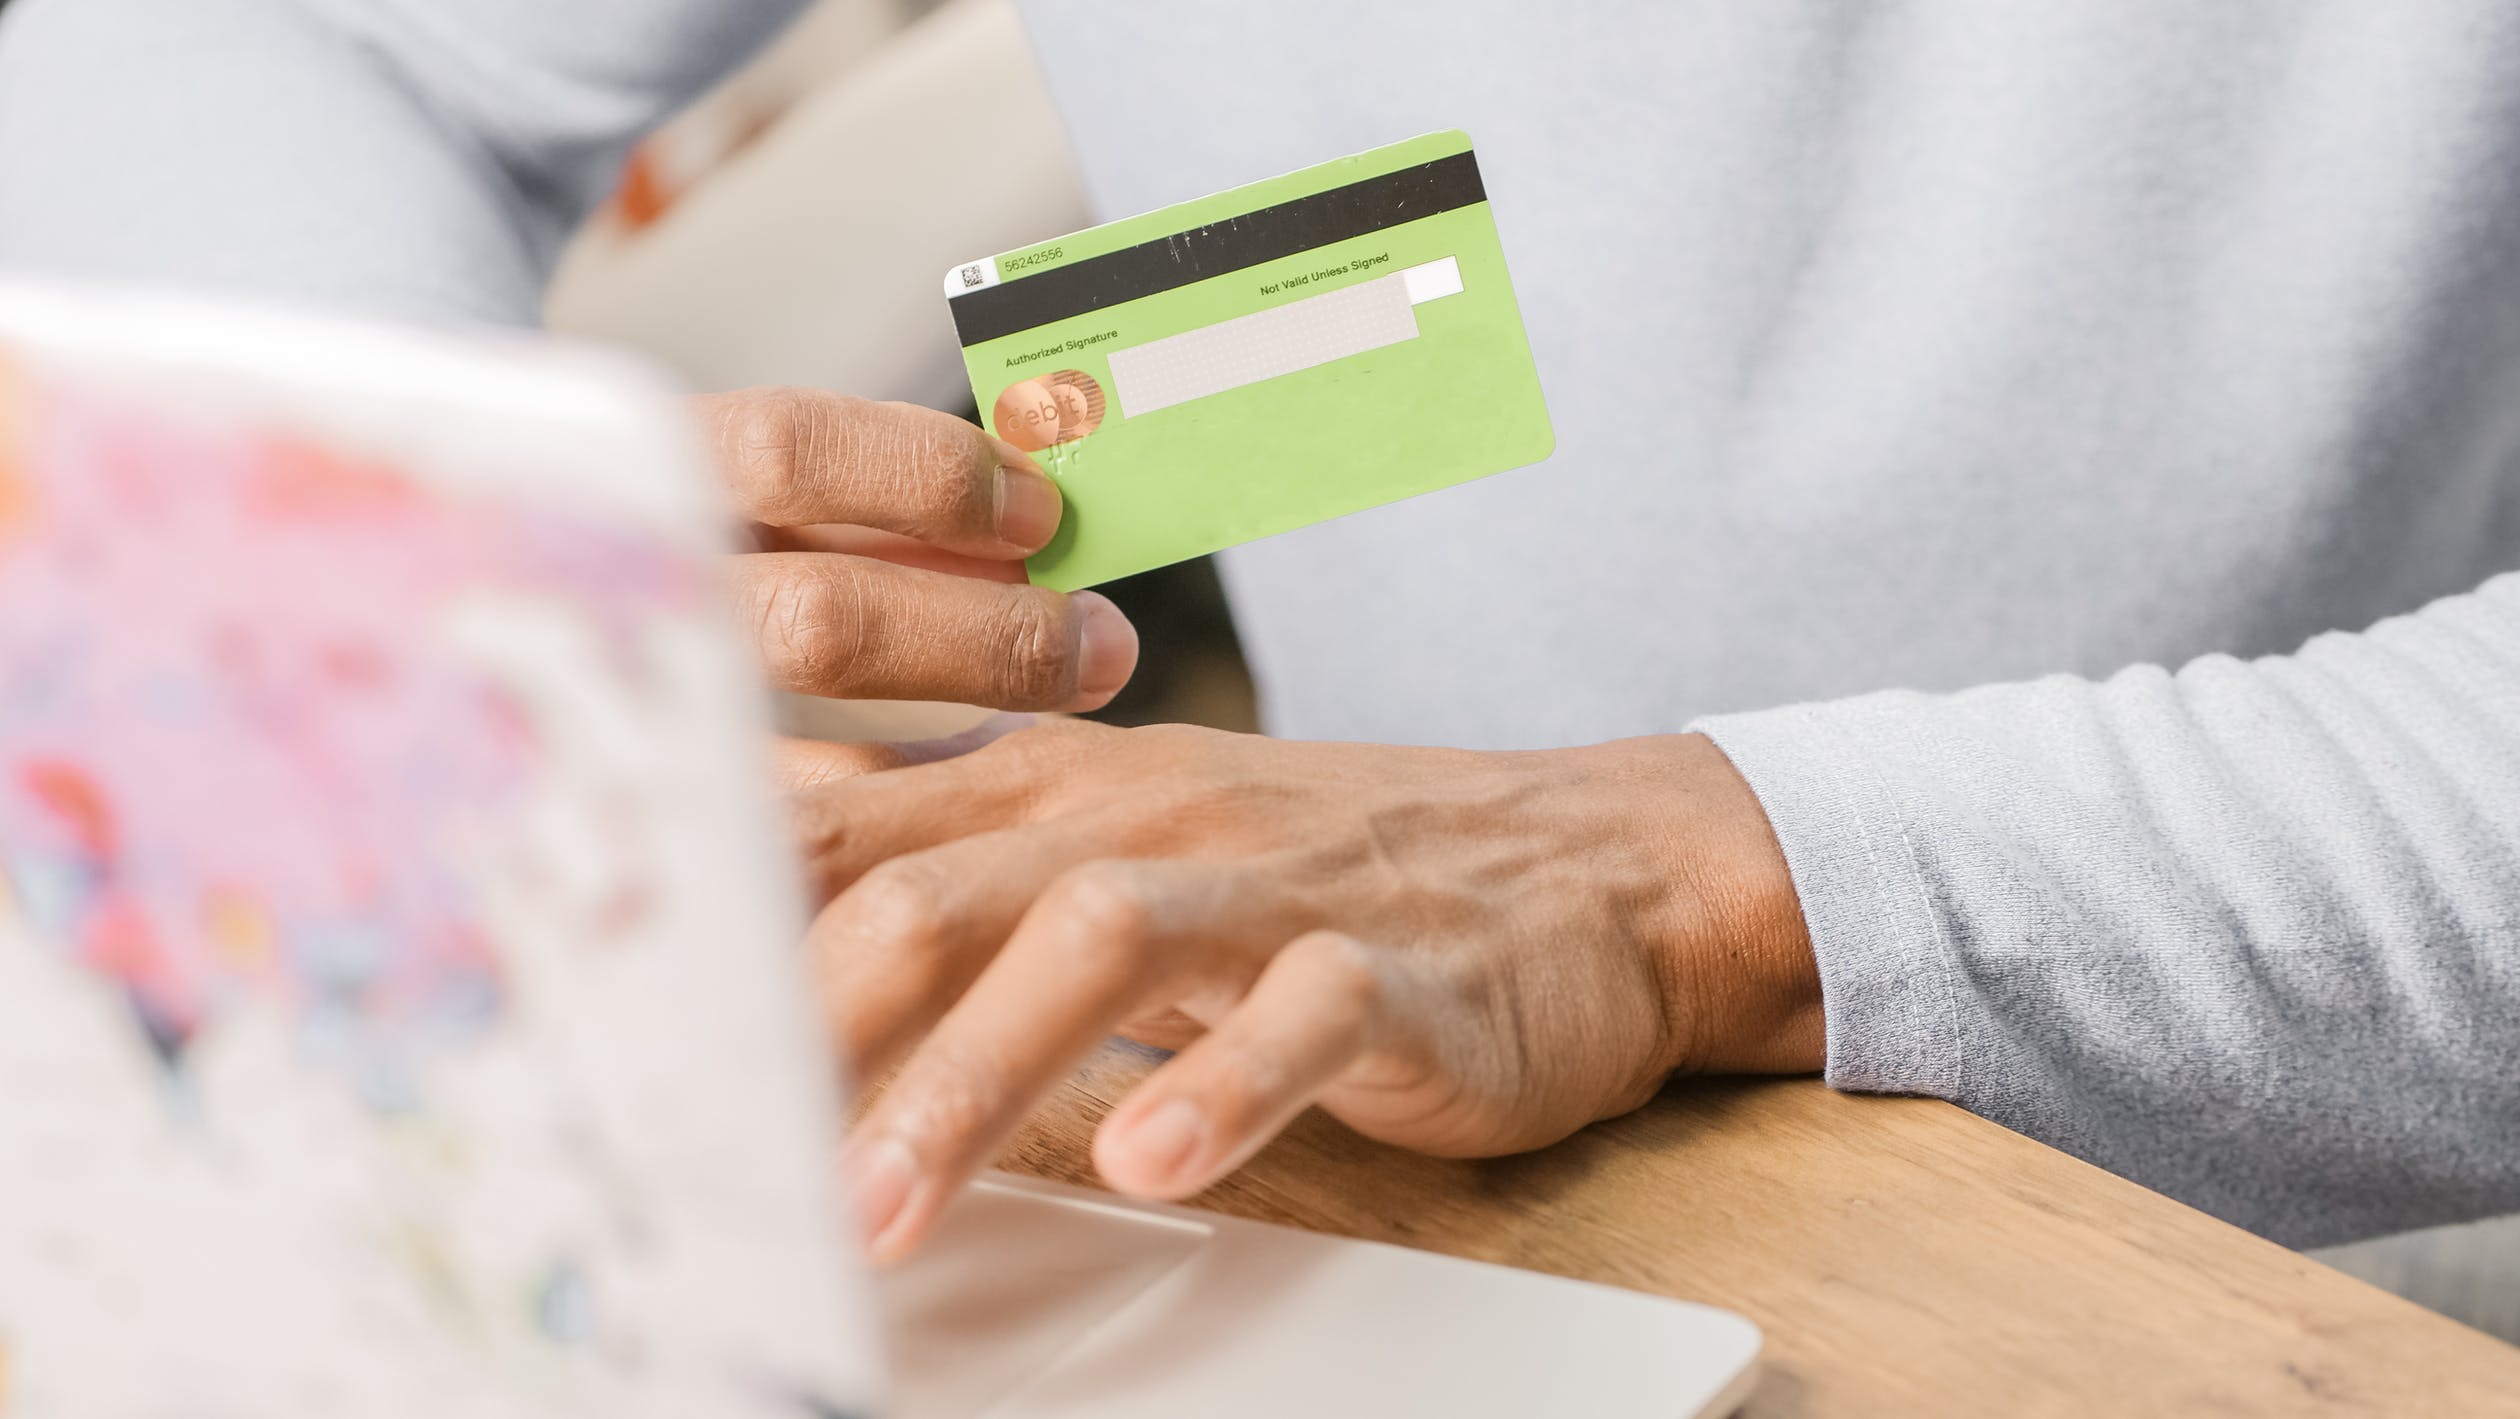 Credit/Debit Payments